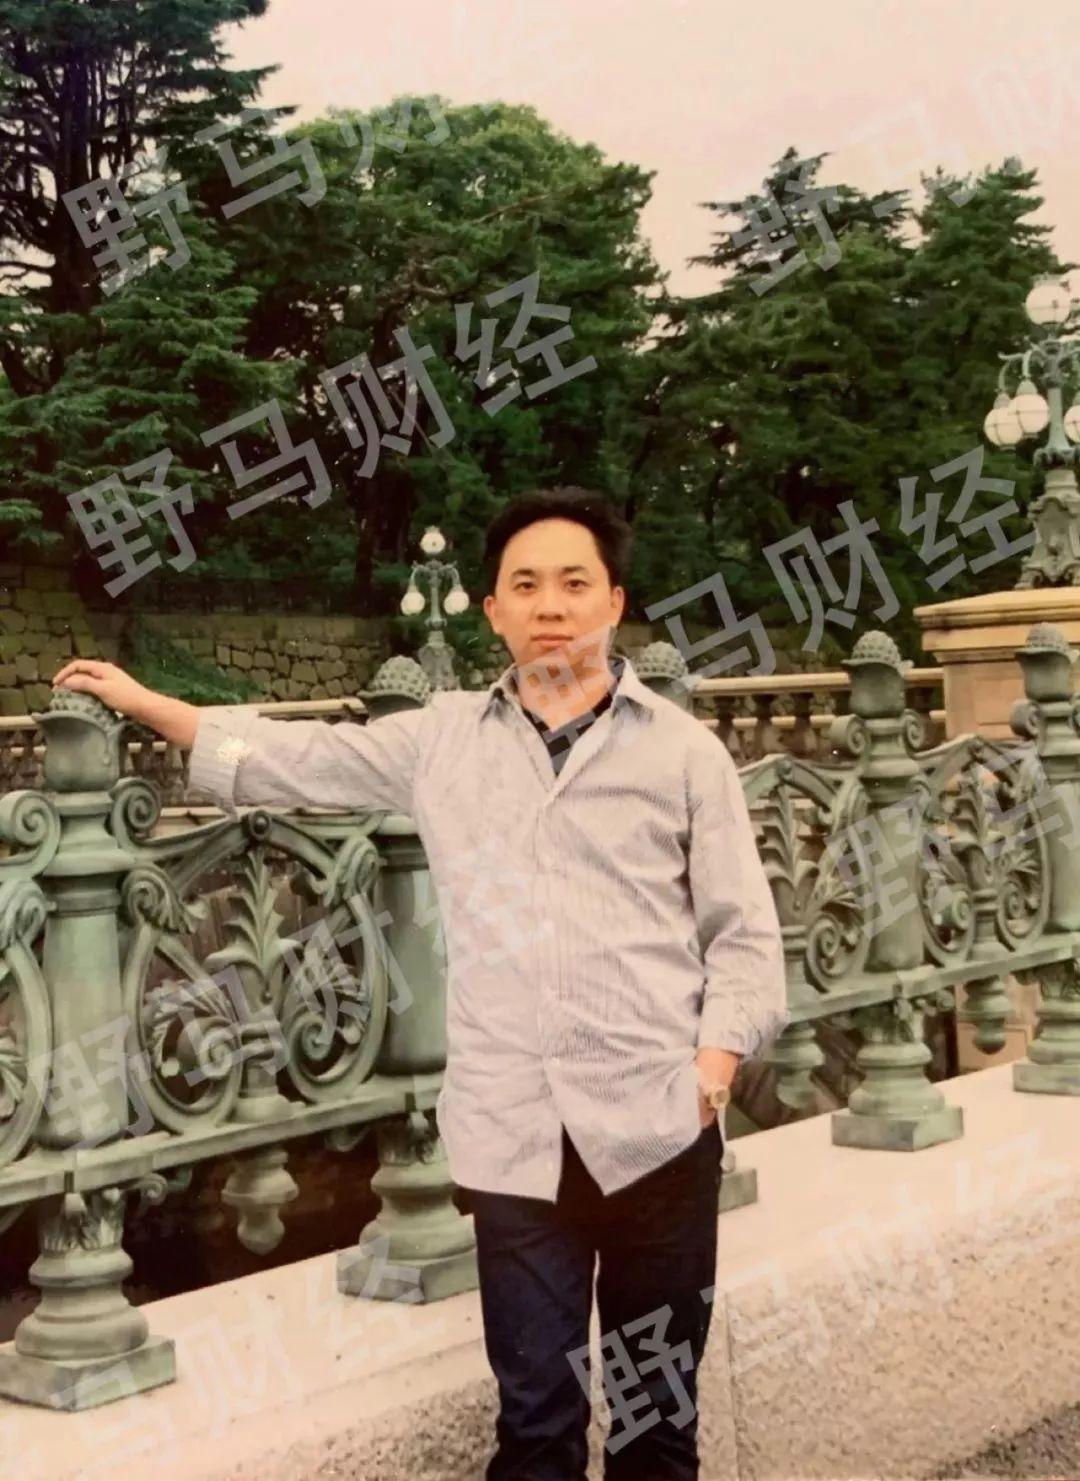 A股迎百亿财产分割案:私募一哥徐翔老婆要离婚